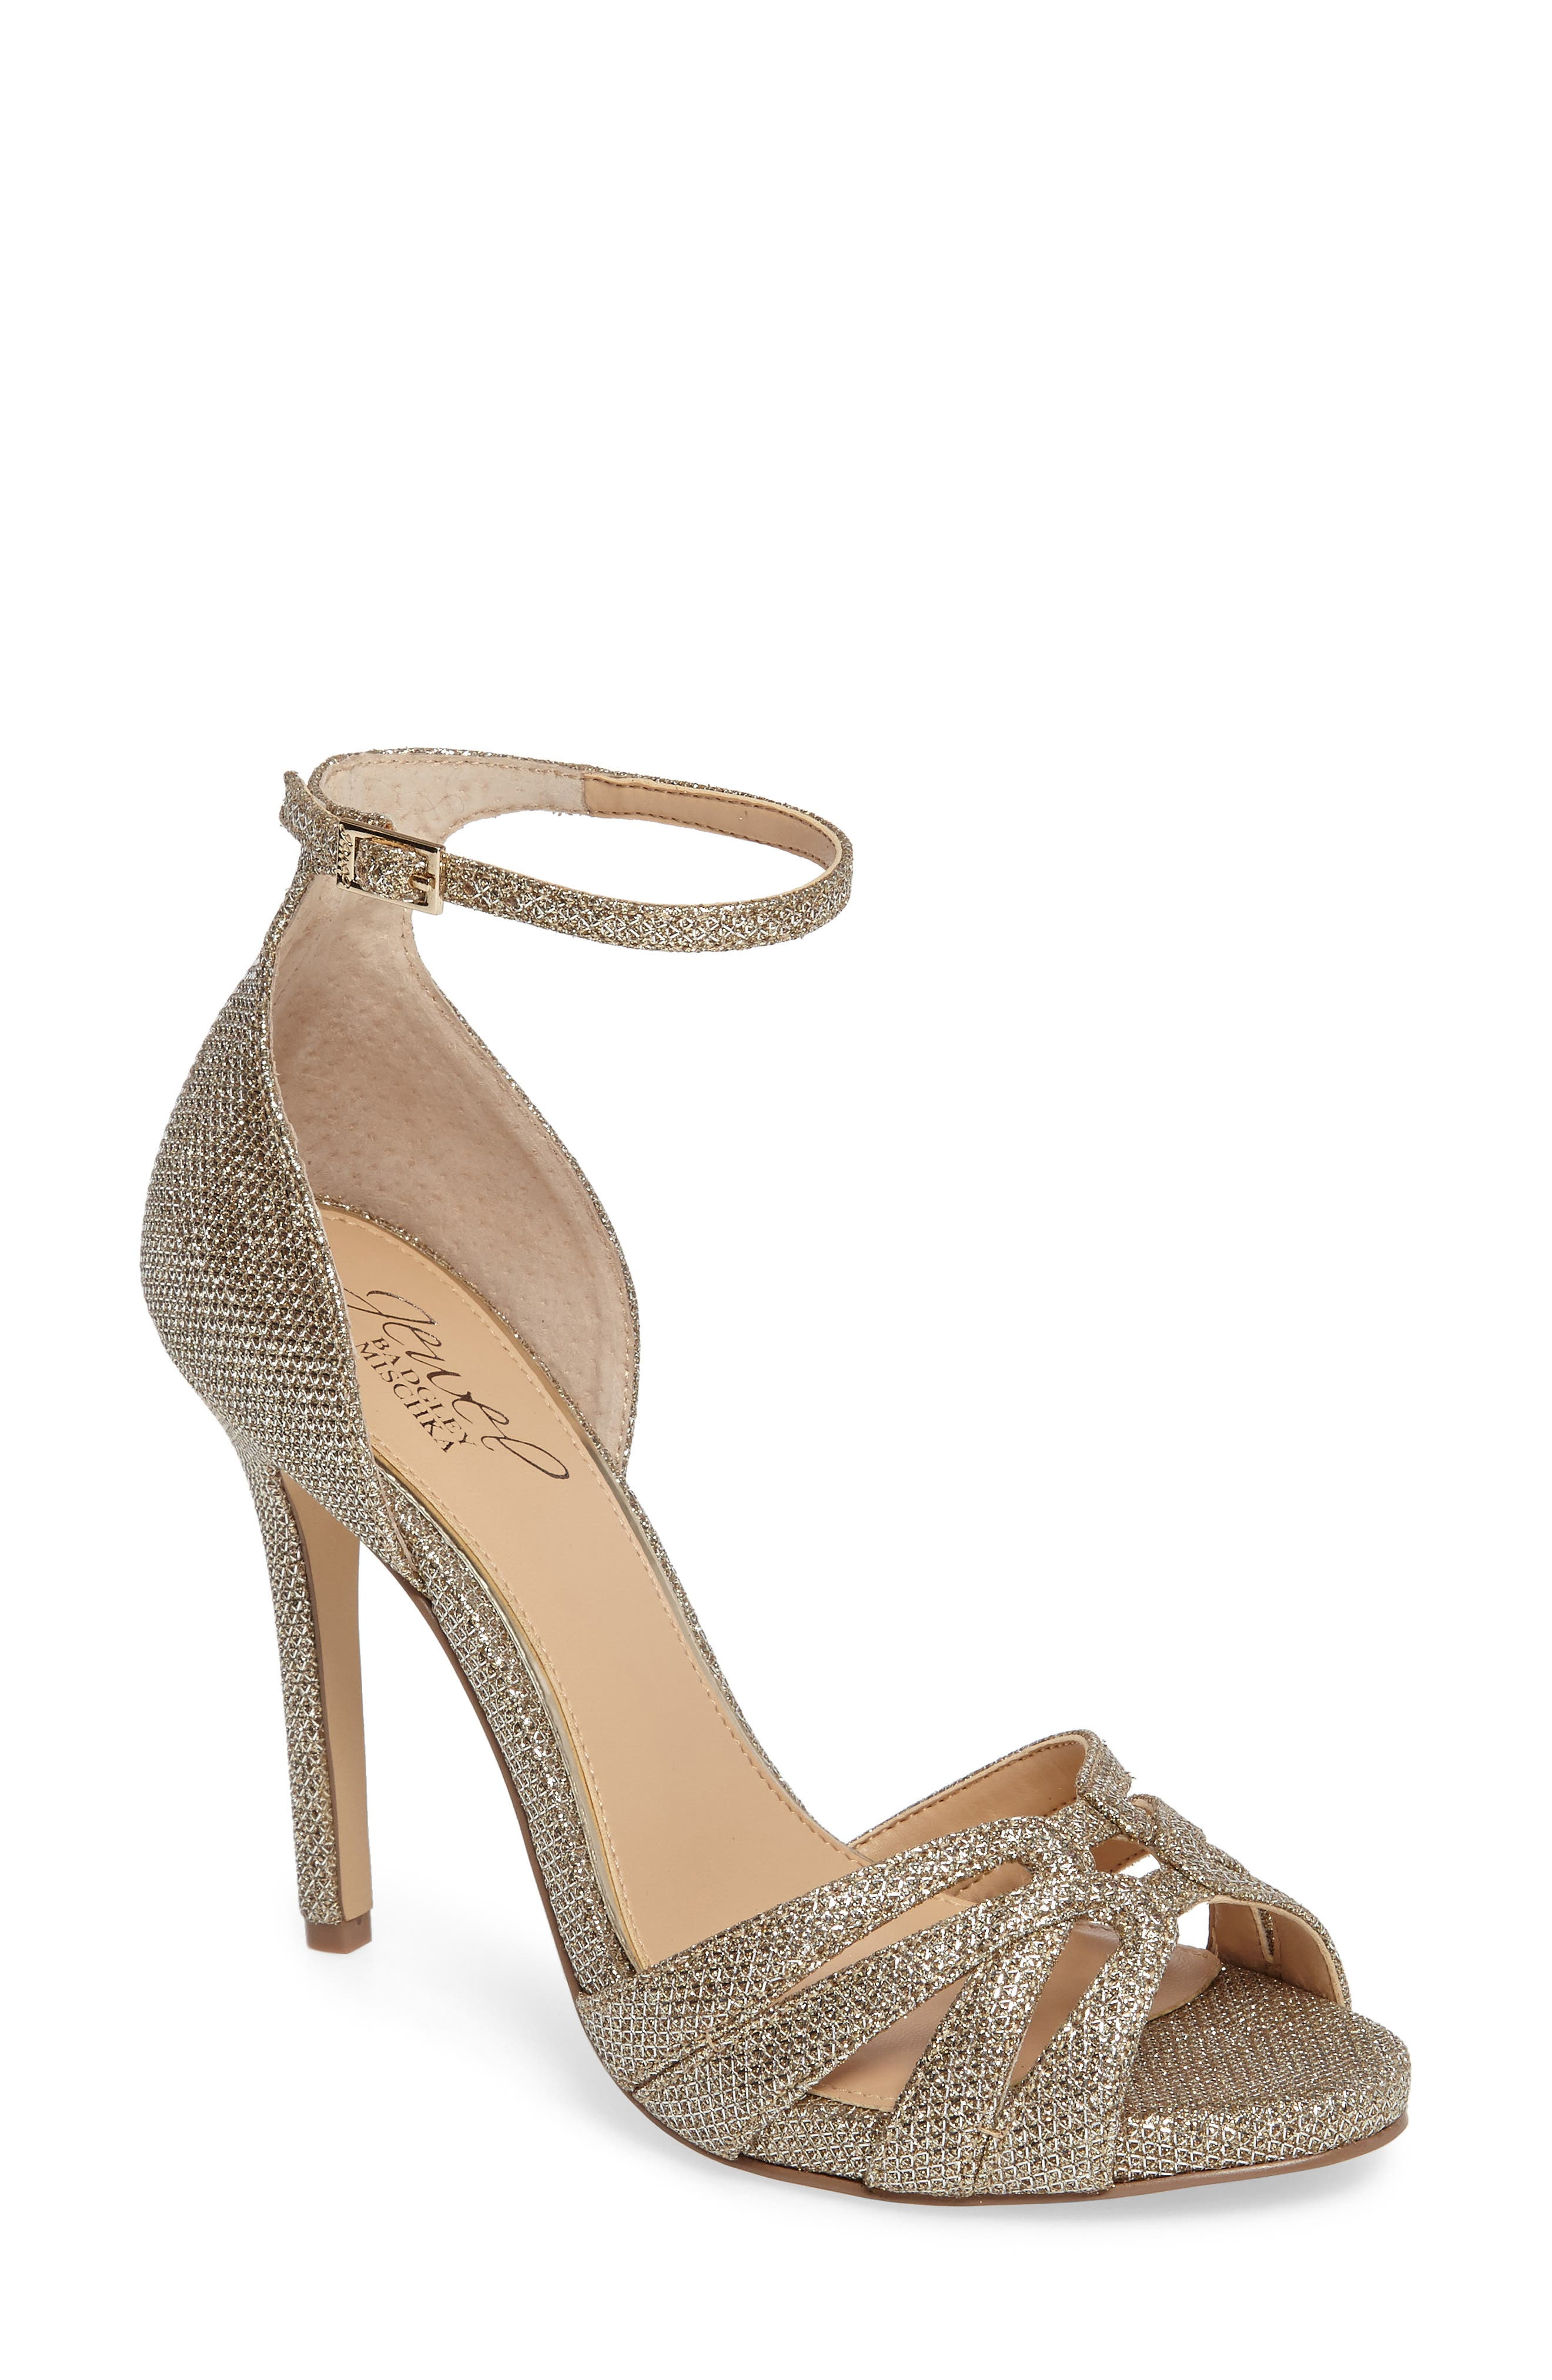 JEWEL BADGLEY MISCHKA Loyal Glitter Sandal